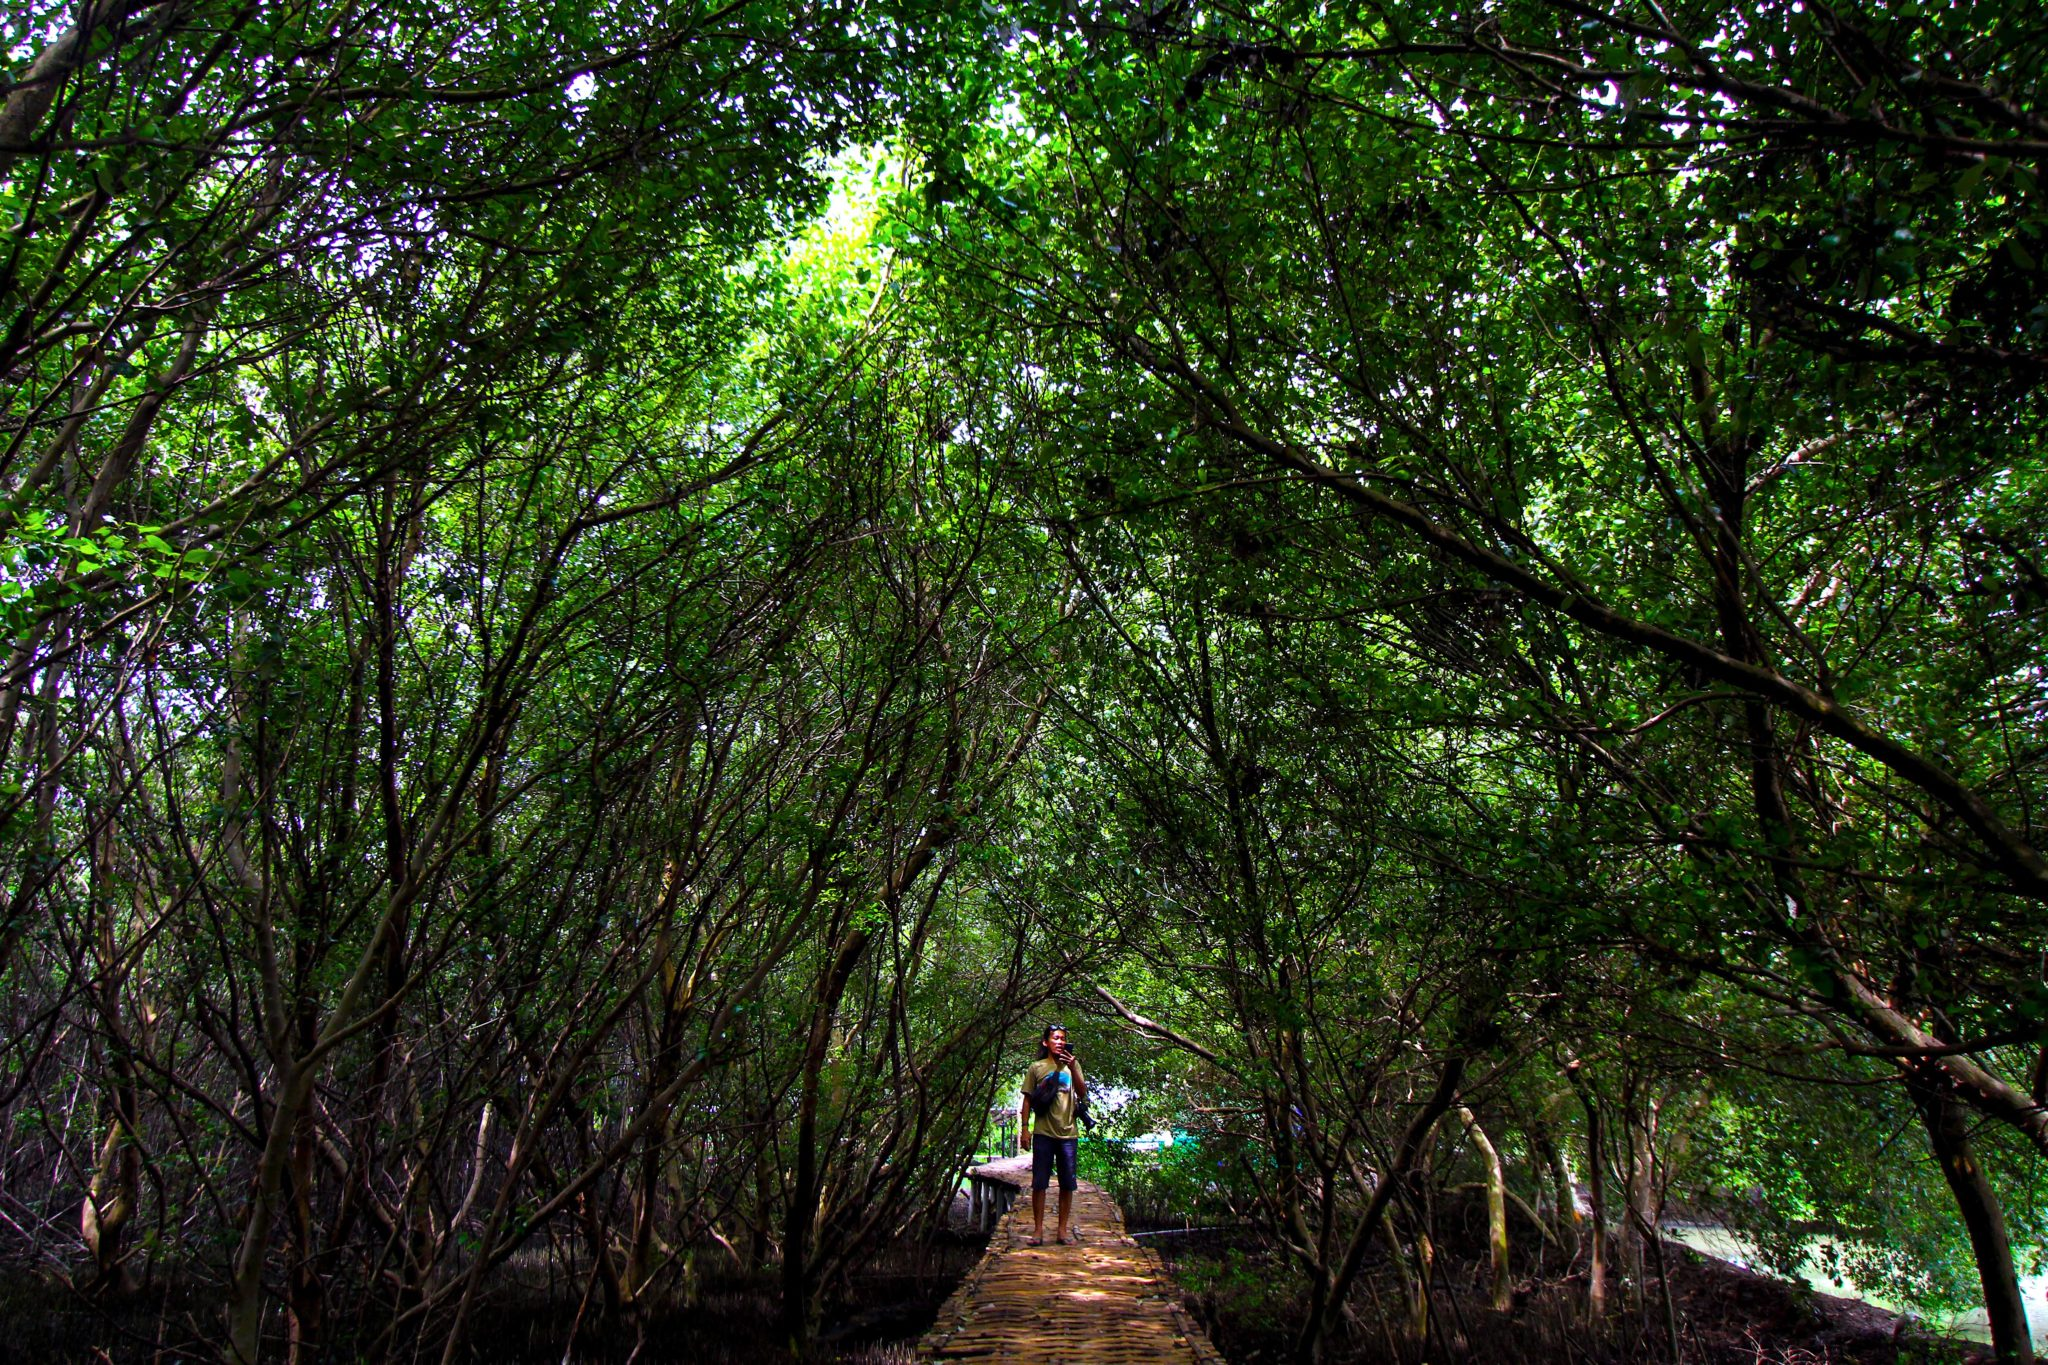 Lebat teduhnya kawasan hutan mangrove Suasana kawasan mangrove di Desa Karangsong, Kecamatan Indramayu, Kabupaten Indramayu, Jawa Barat. Foto : Donny Iqbal/Mongabay Indonesia